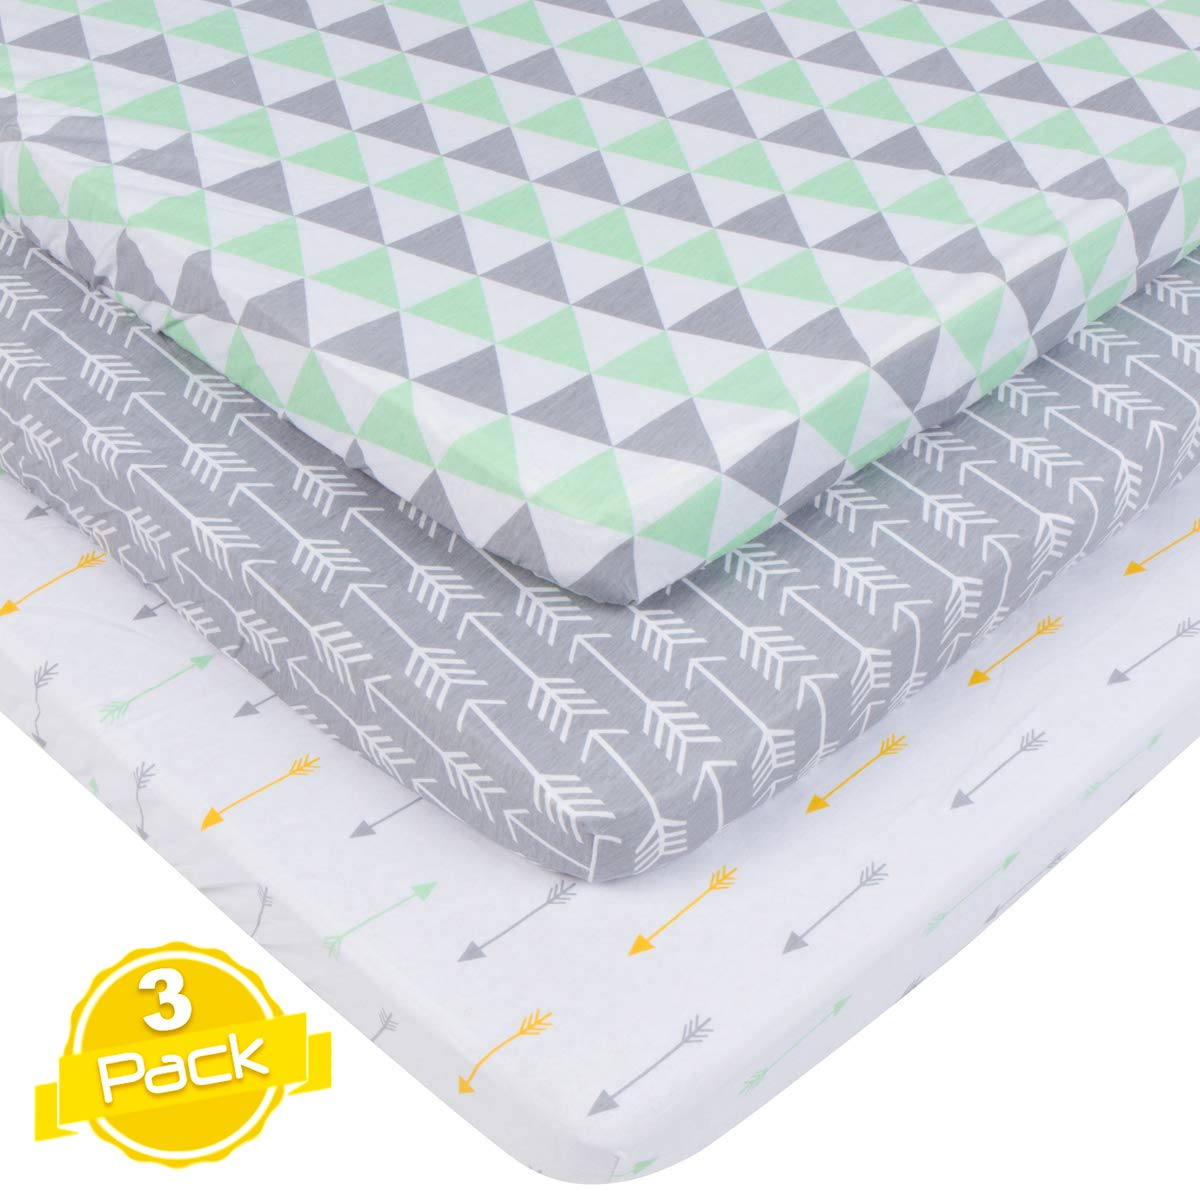 Pack n Play Sheets Set for Playard and Mini Crib Mattresses